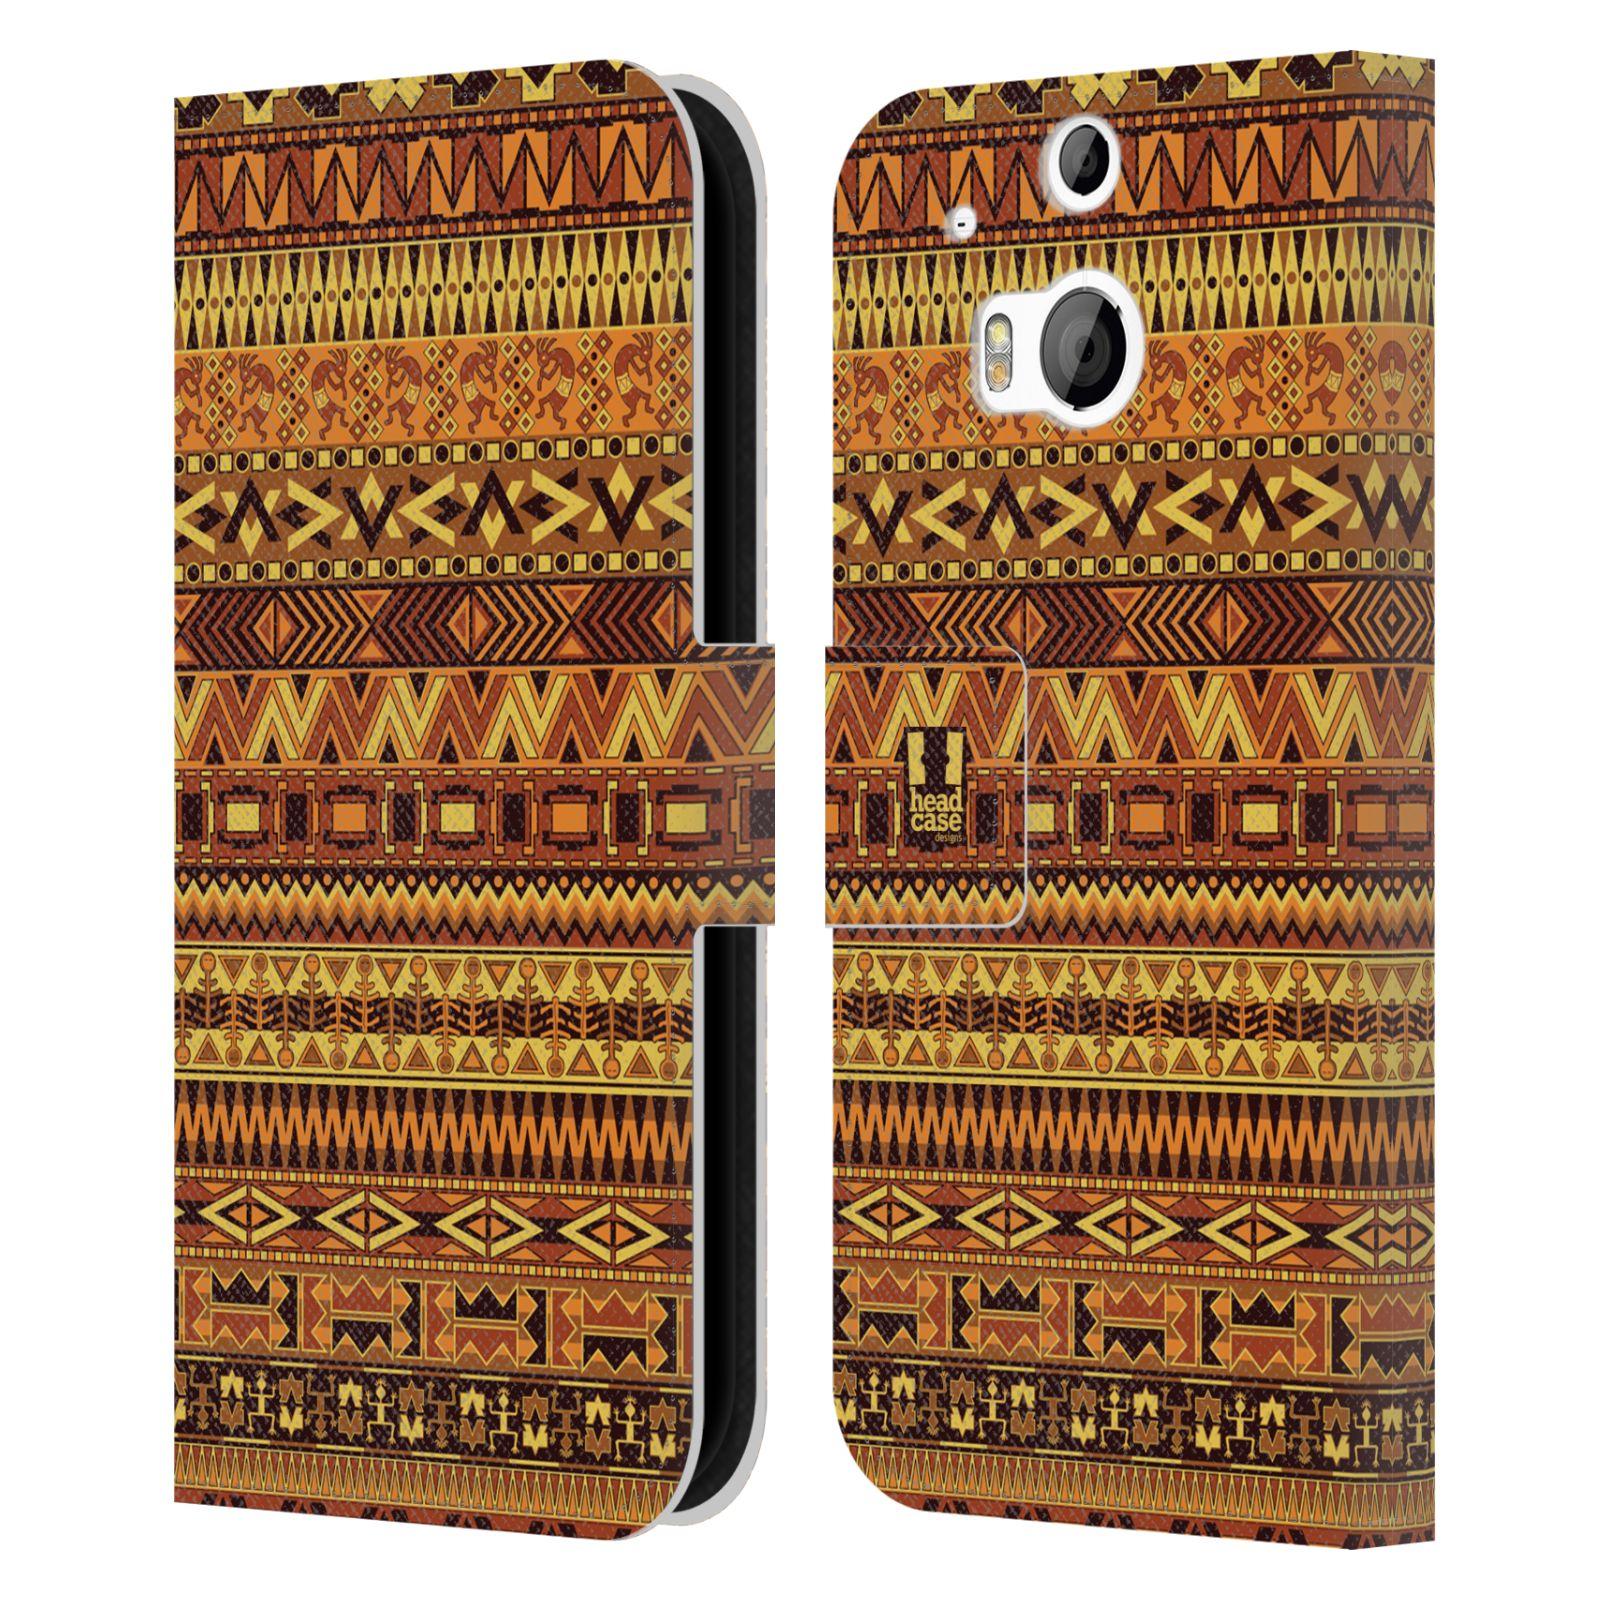 HEAD CASE Flipové pouzdro pro mobil HTC ONE (M8, M8s) Indiánský vzor YELLOW žlutá